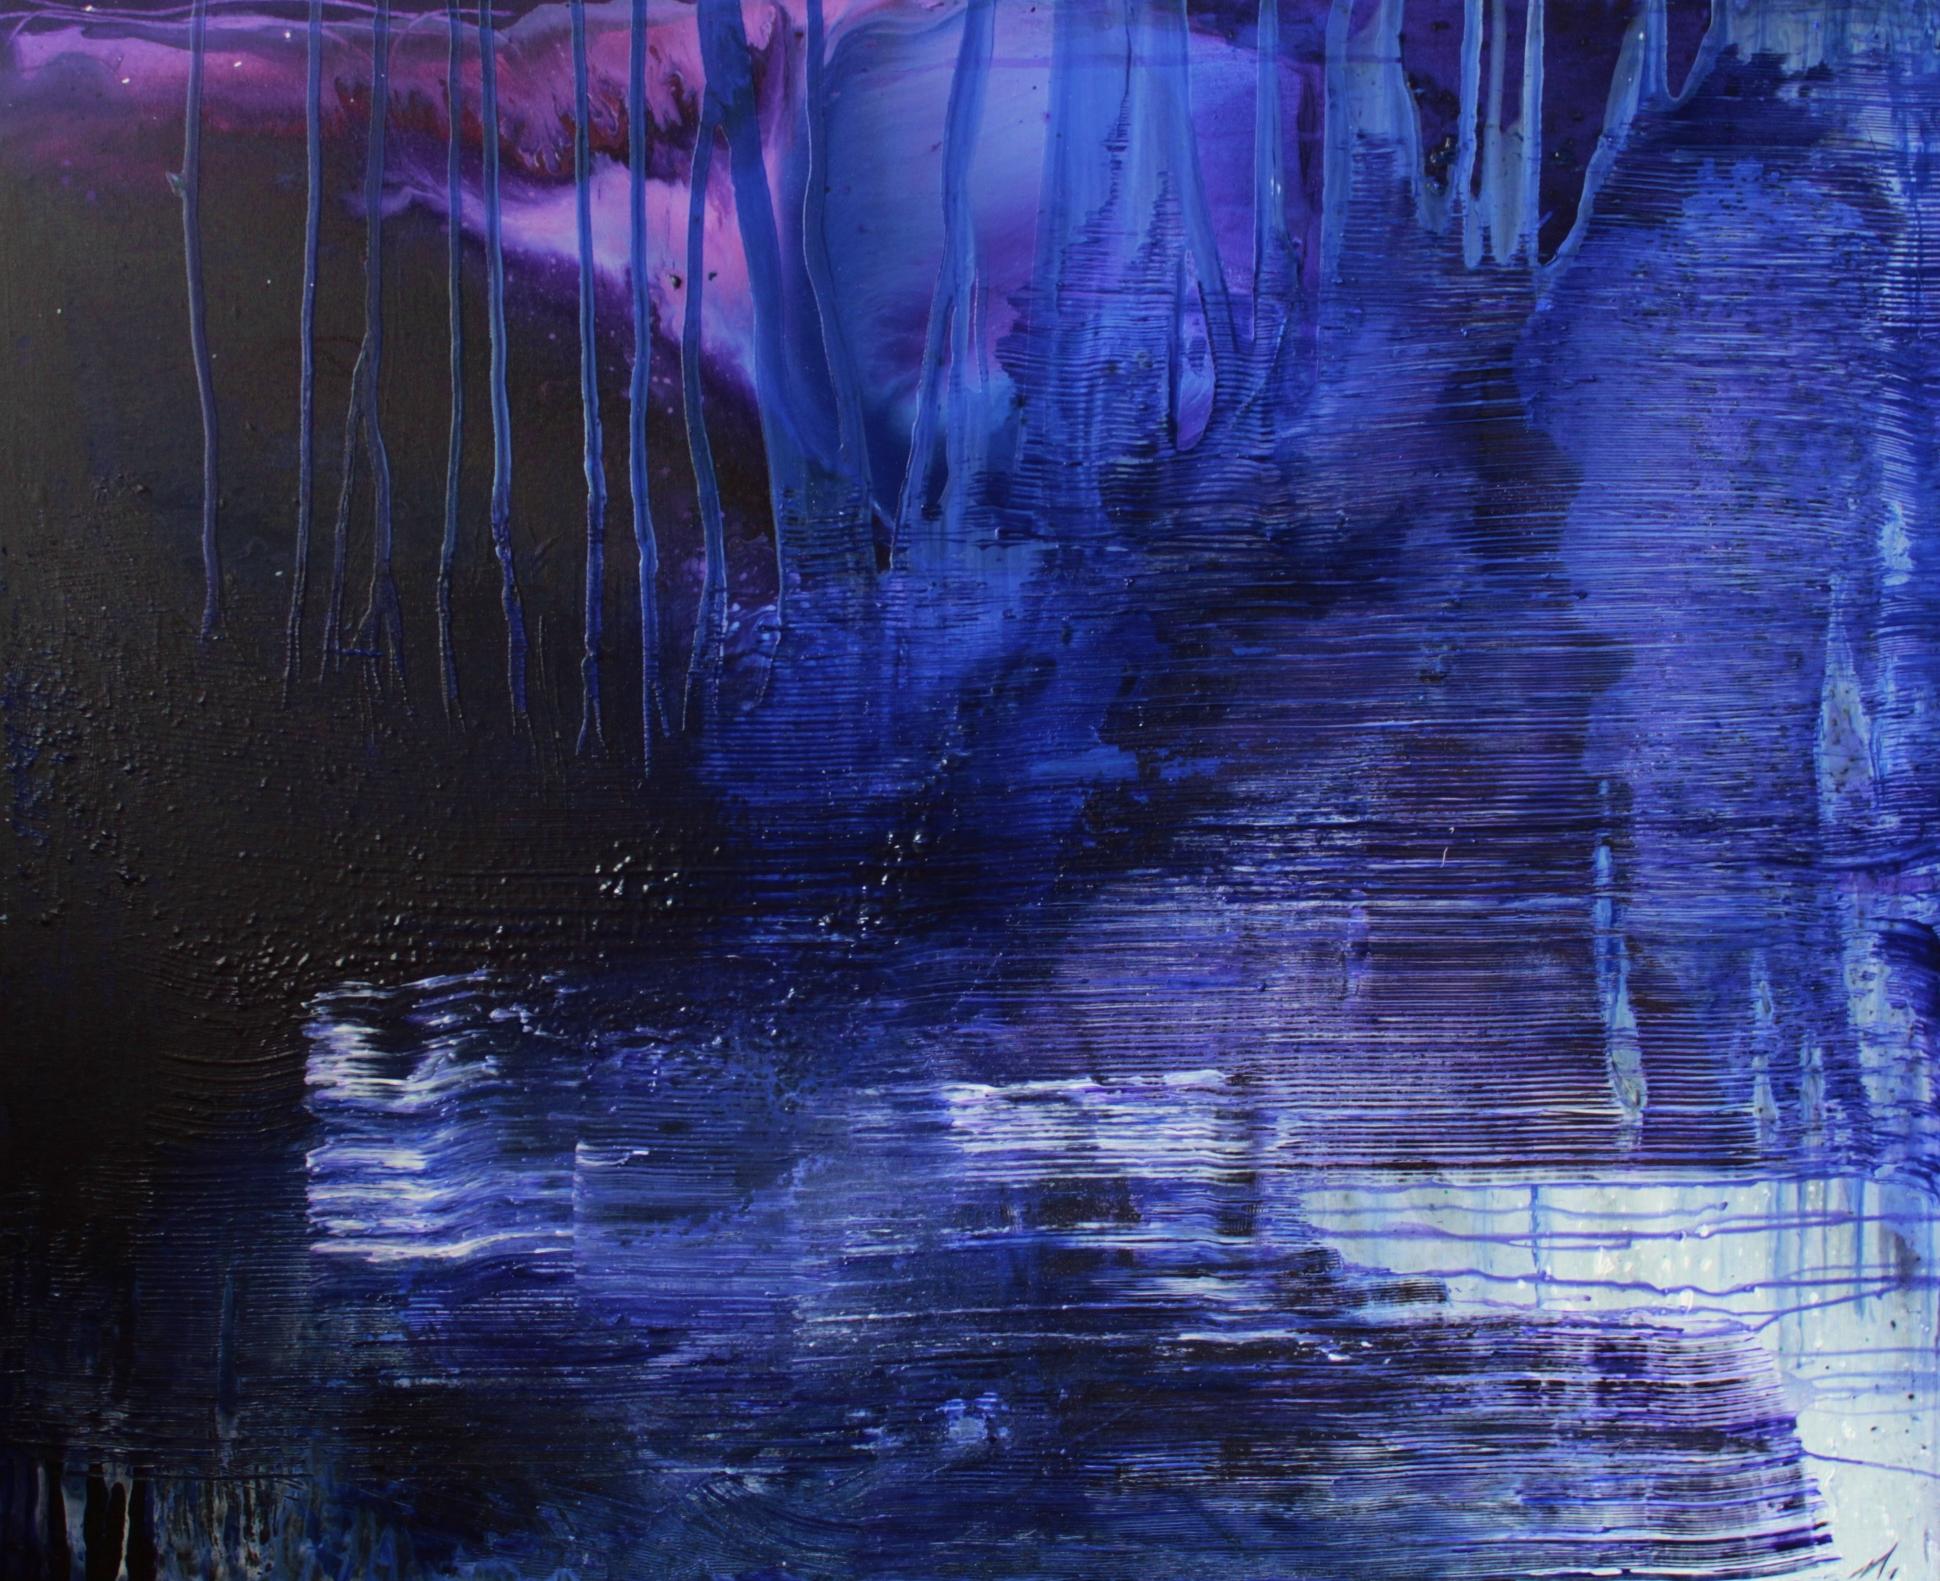 Taajuus, Akryyli kankaalle, 81 cm x 100 cm  Myyty / Sold